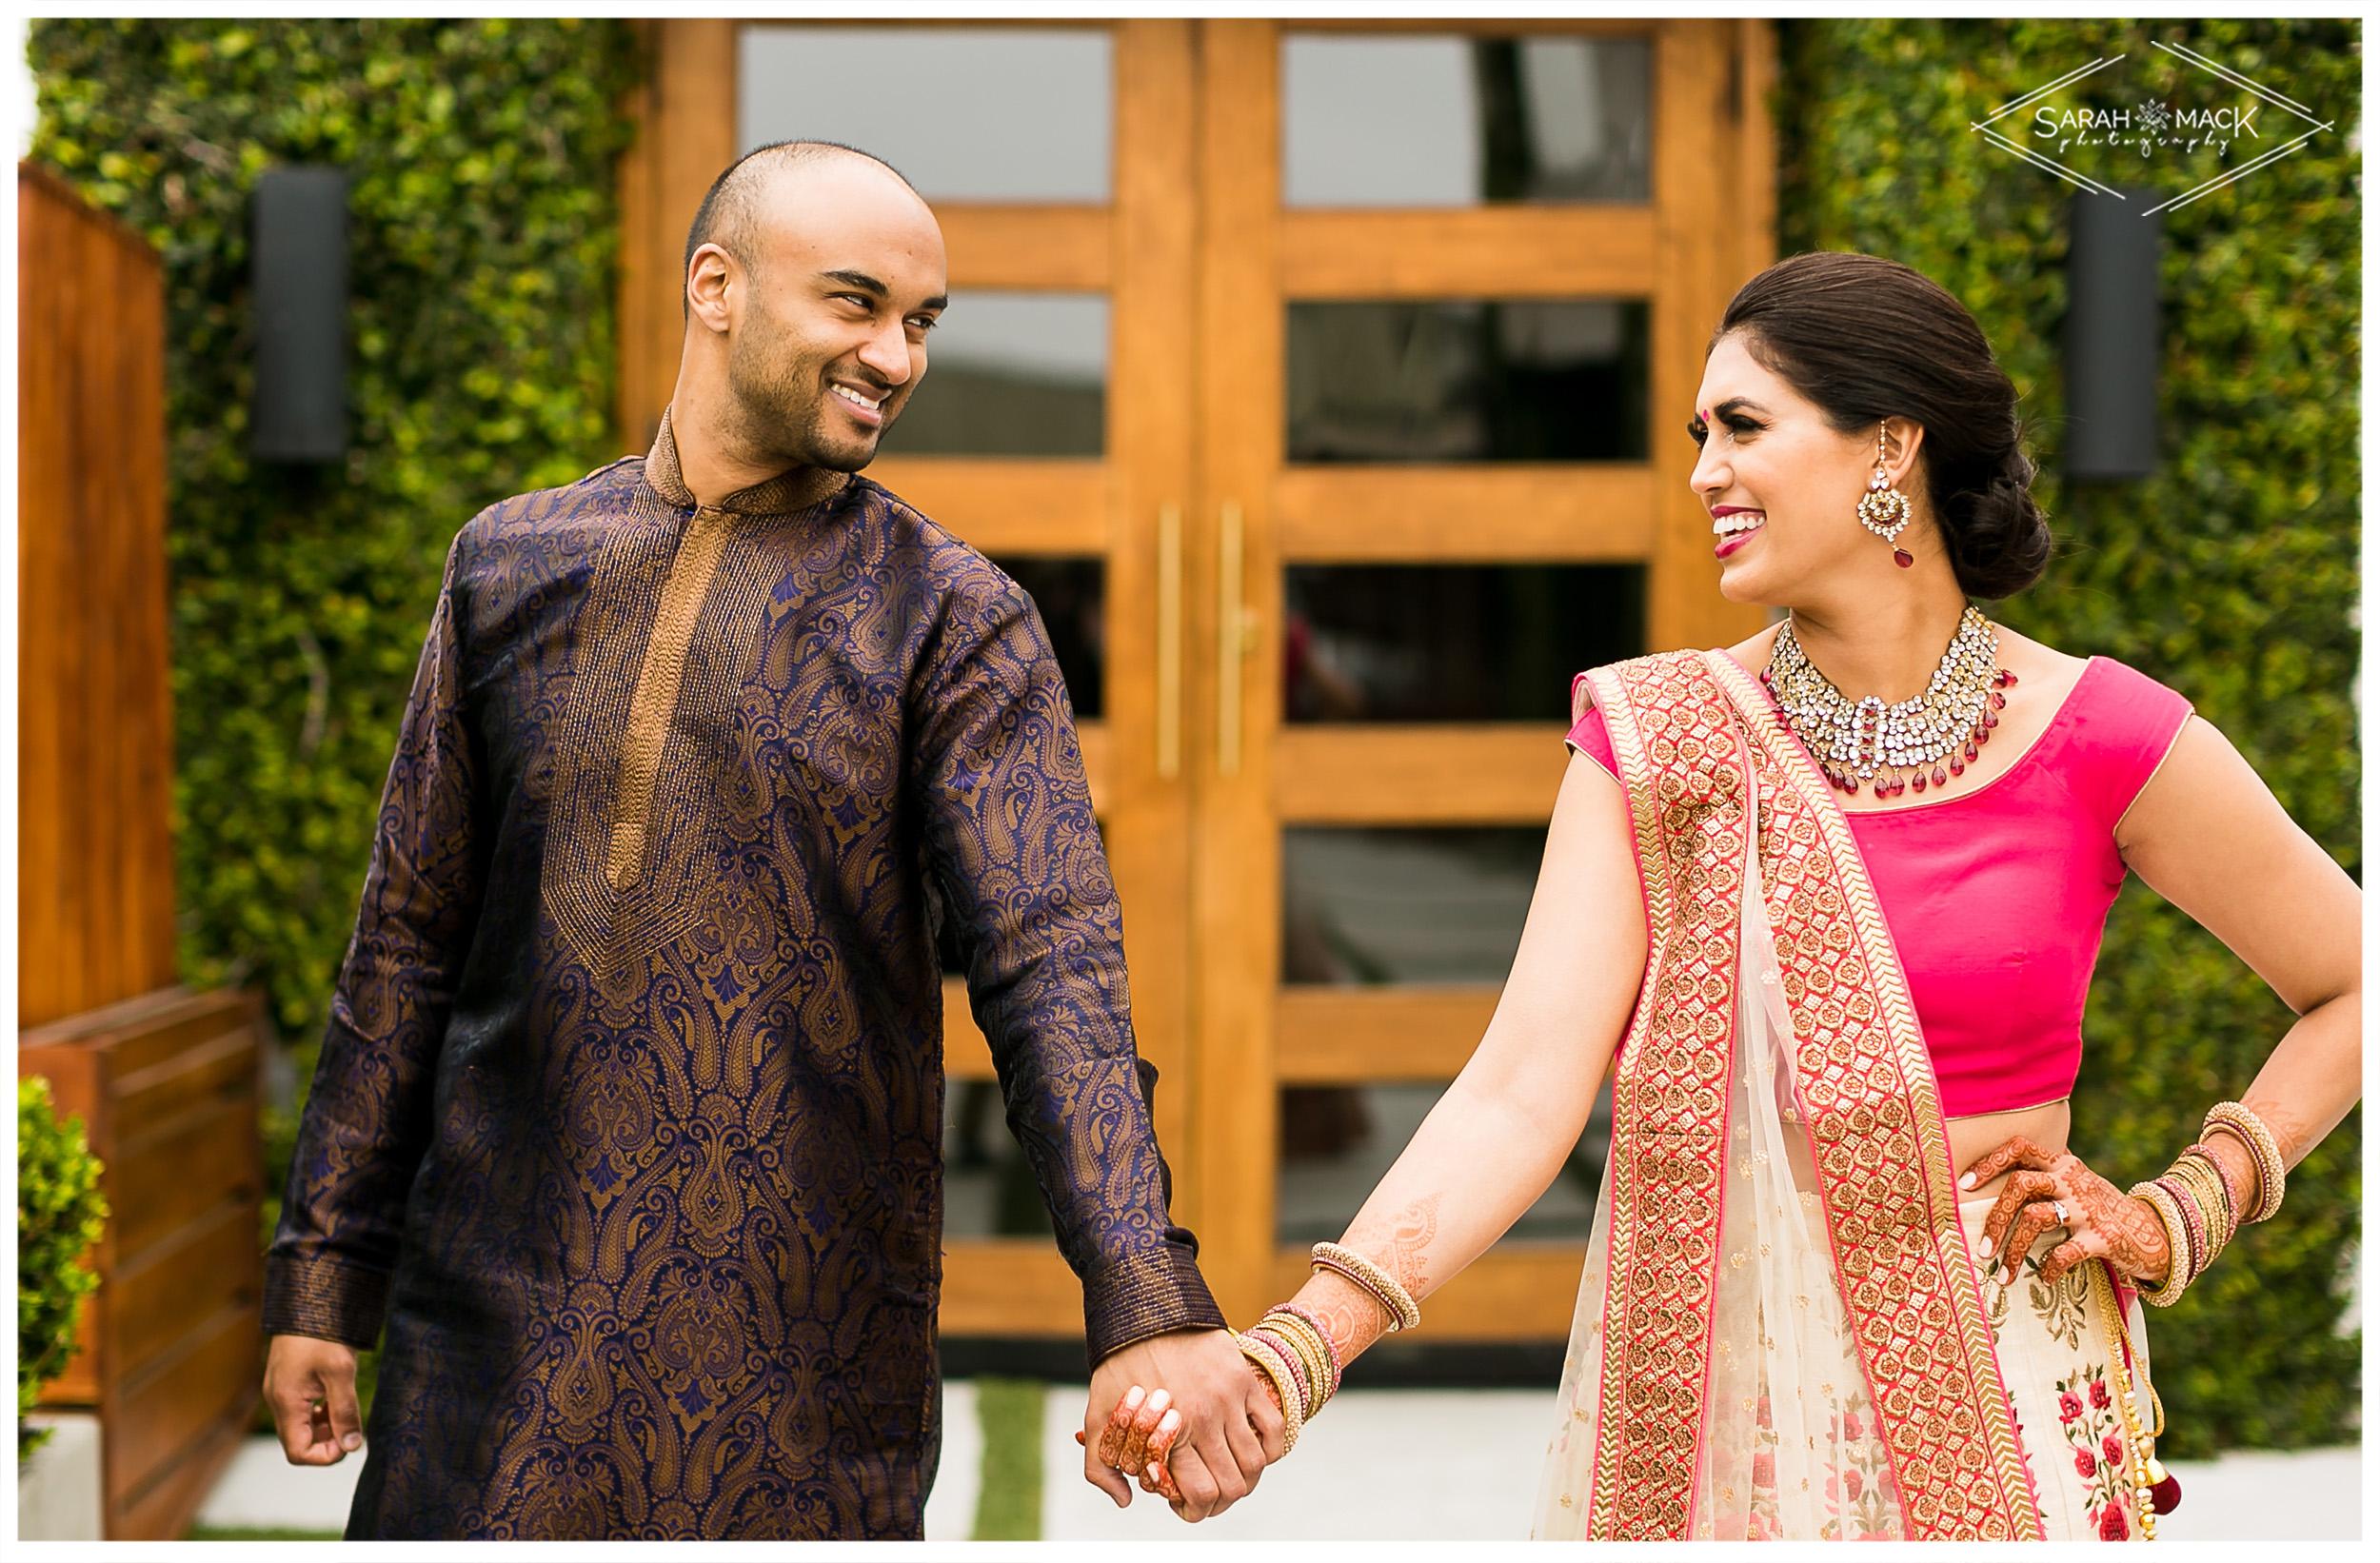 PR-Irvine-Ganesh-Pooja-Indian-Wedding-Photography-13.jpg